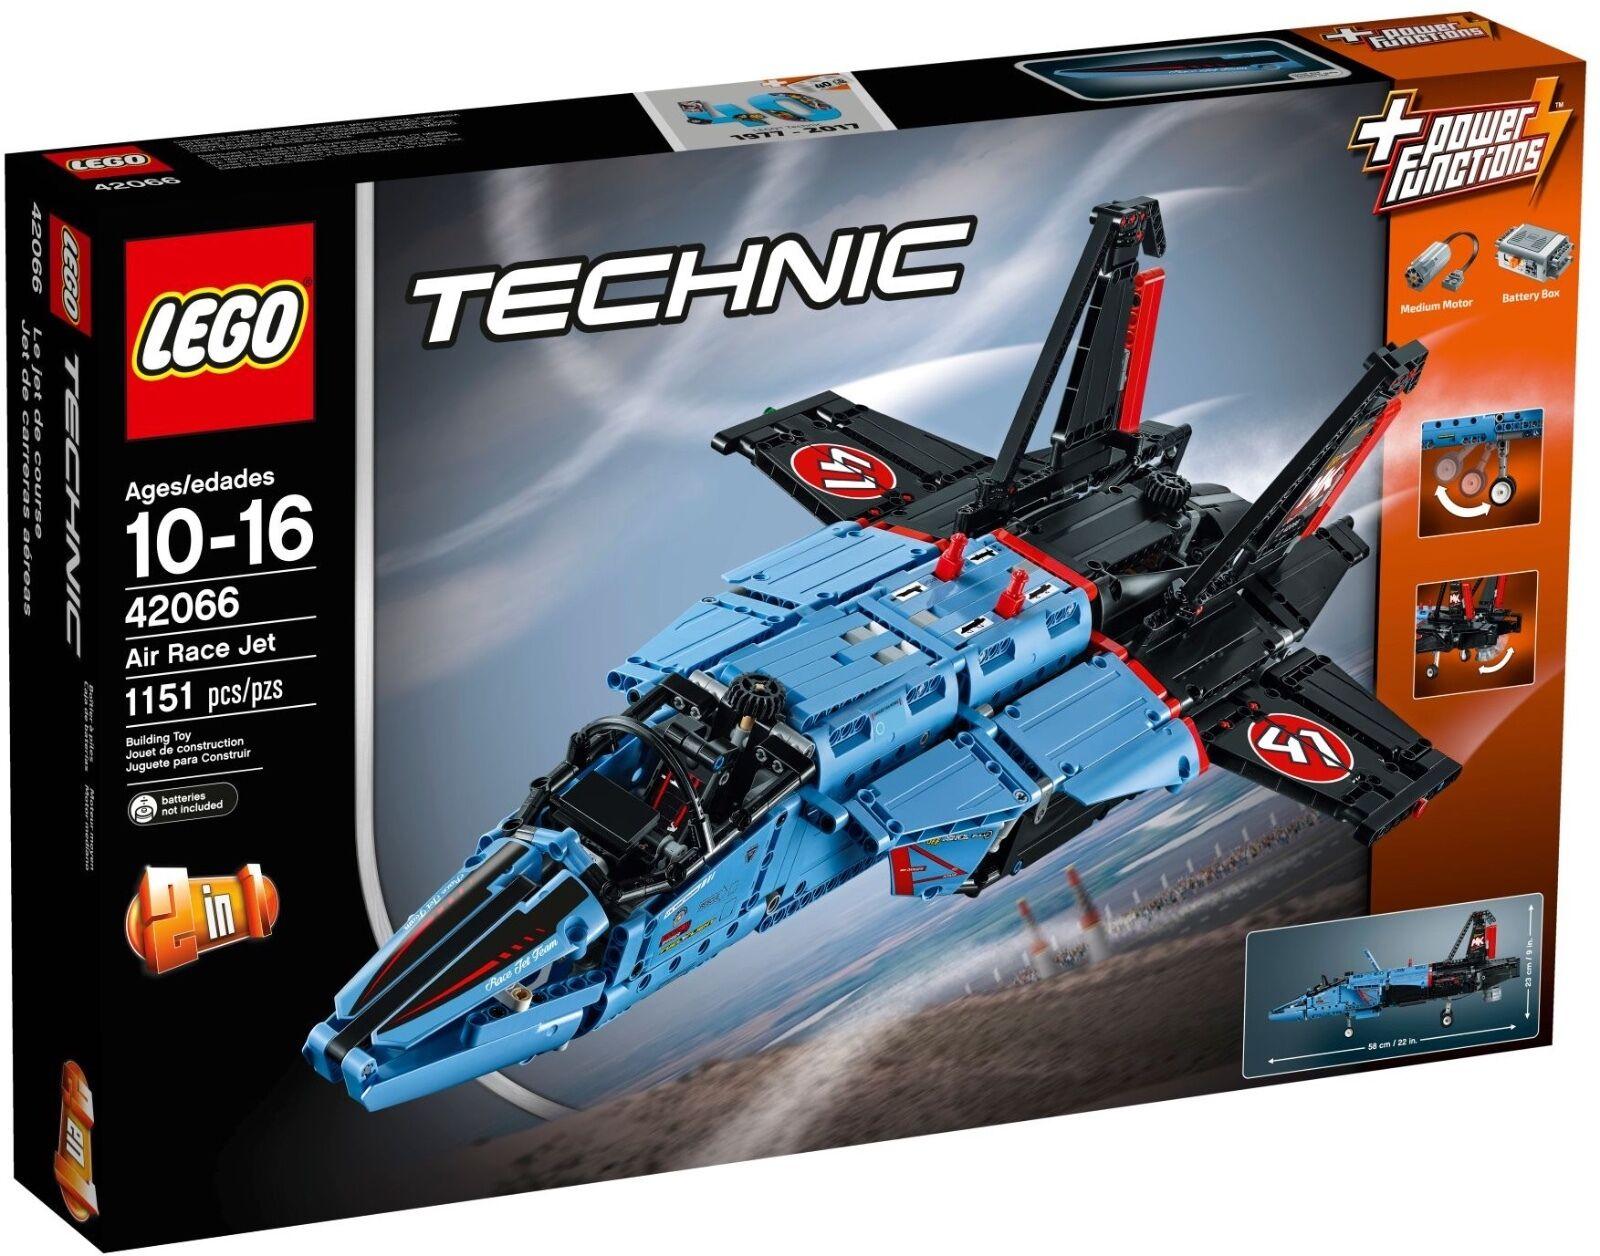 Lego ® Technic 42066 Air Race jet nuevo embalaje original New misb NRFB